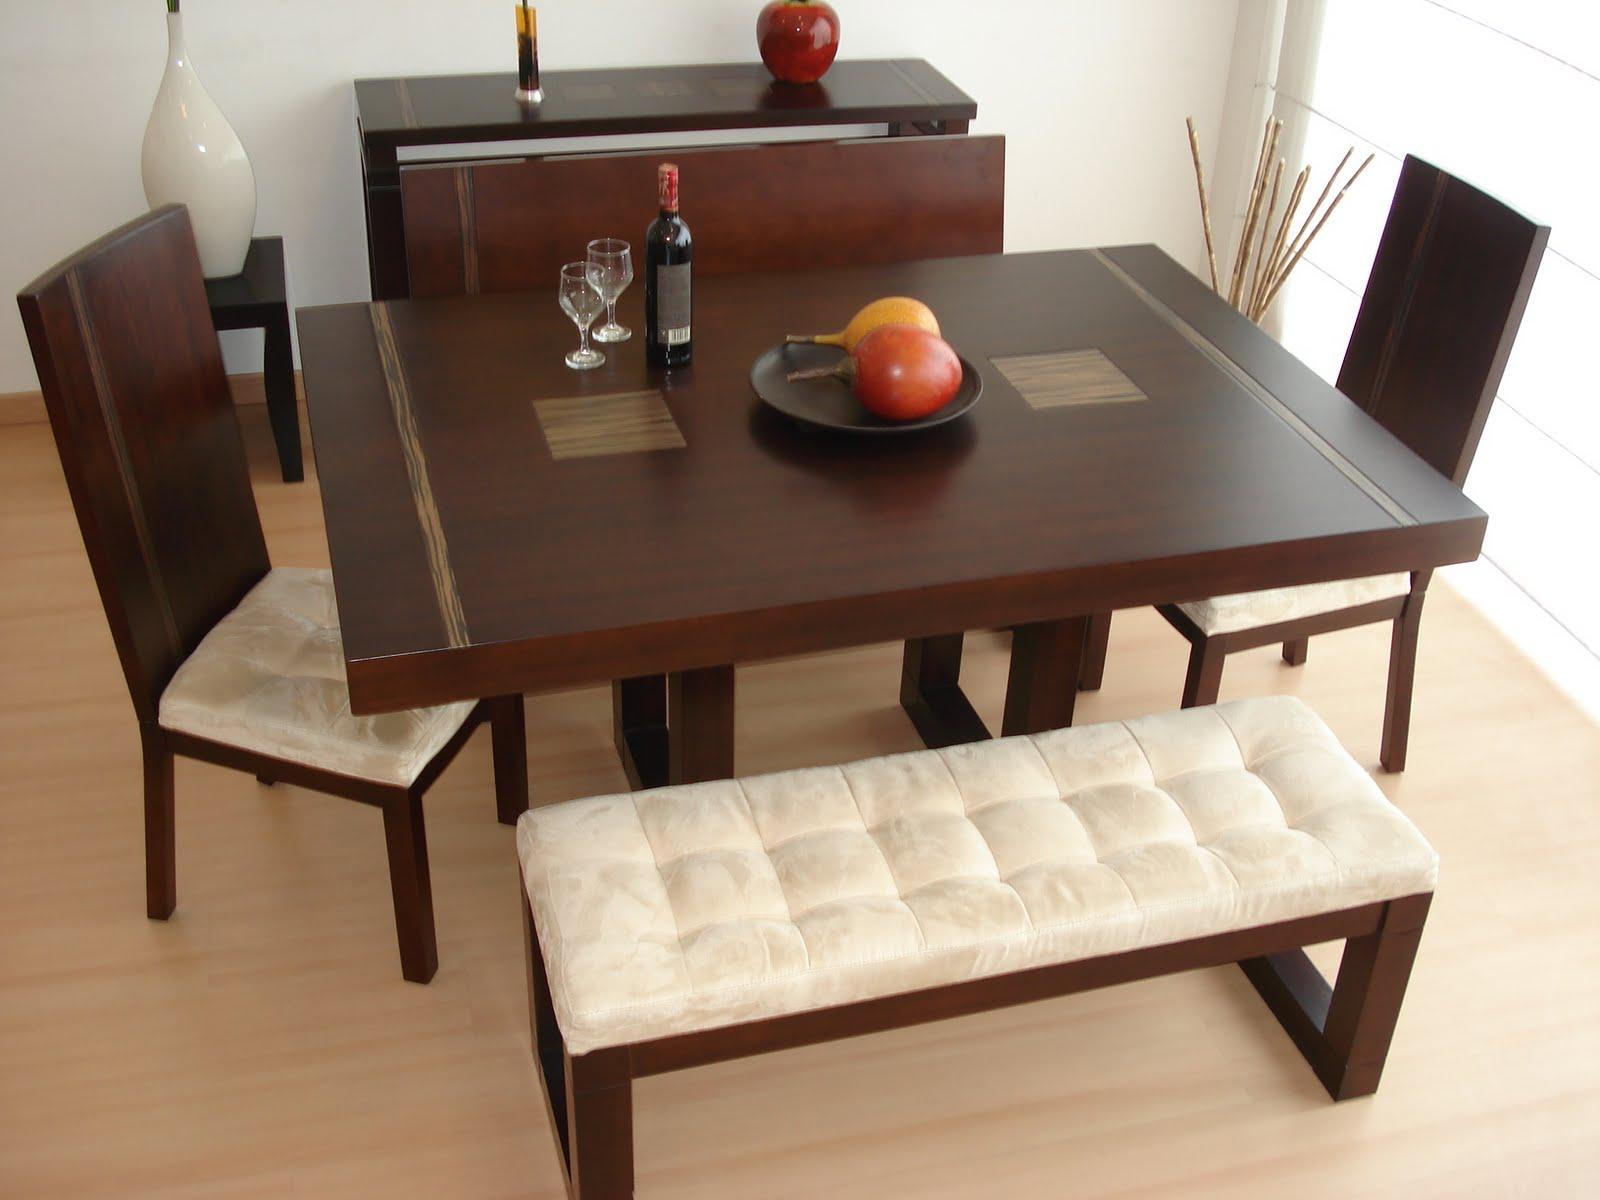 Dise o interior comedores for Comedores de madera baratos